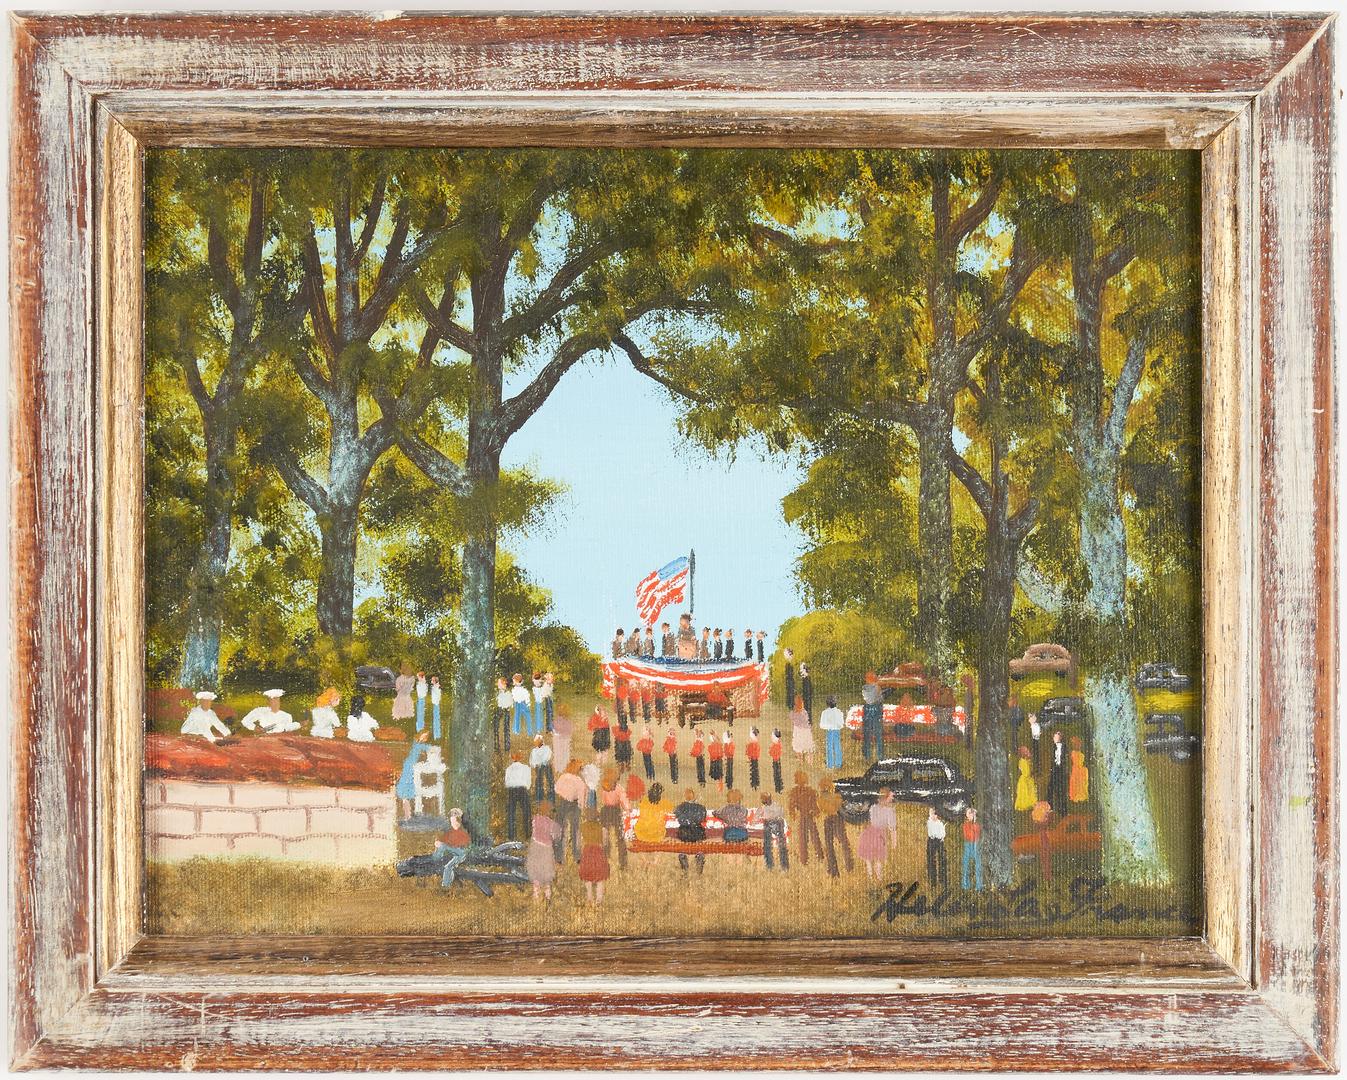 Lot 146: Helen LaFrance O/C, Fourth of July Picnic